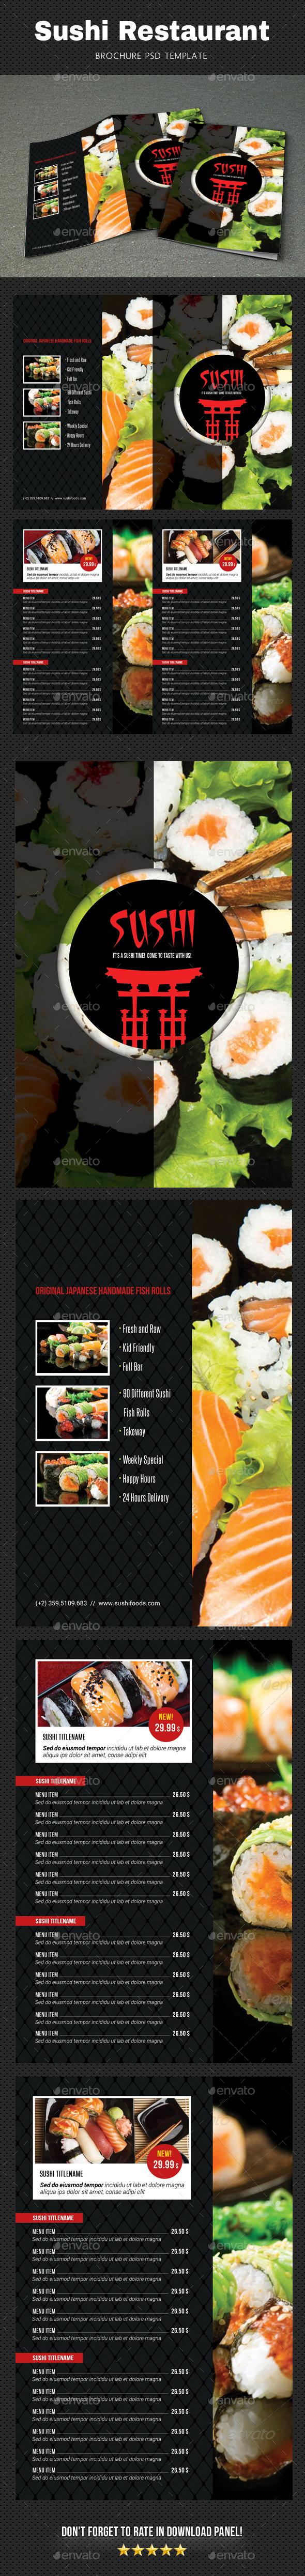 GraphicRiver Sushi Menu Brochure 2 20815326